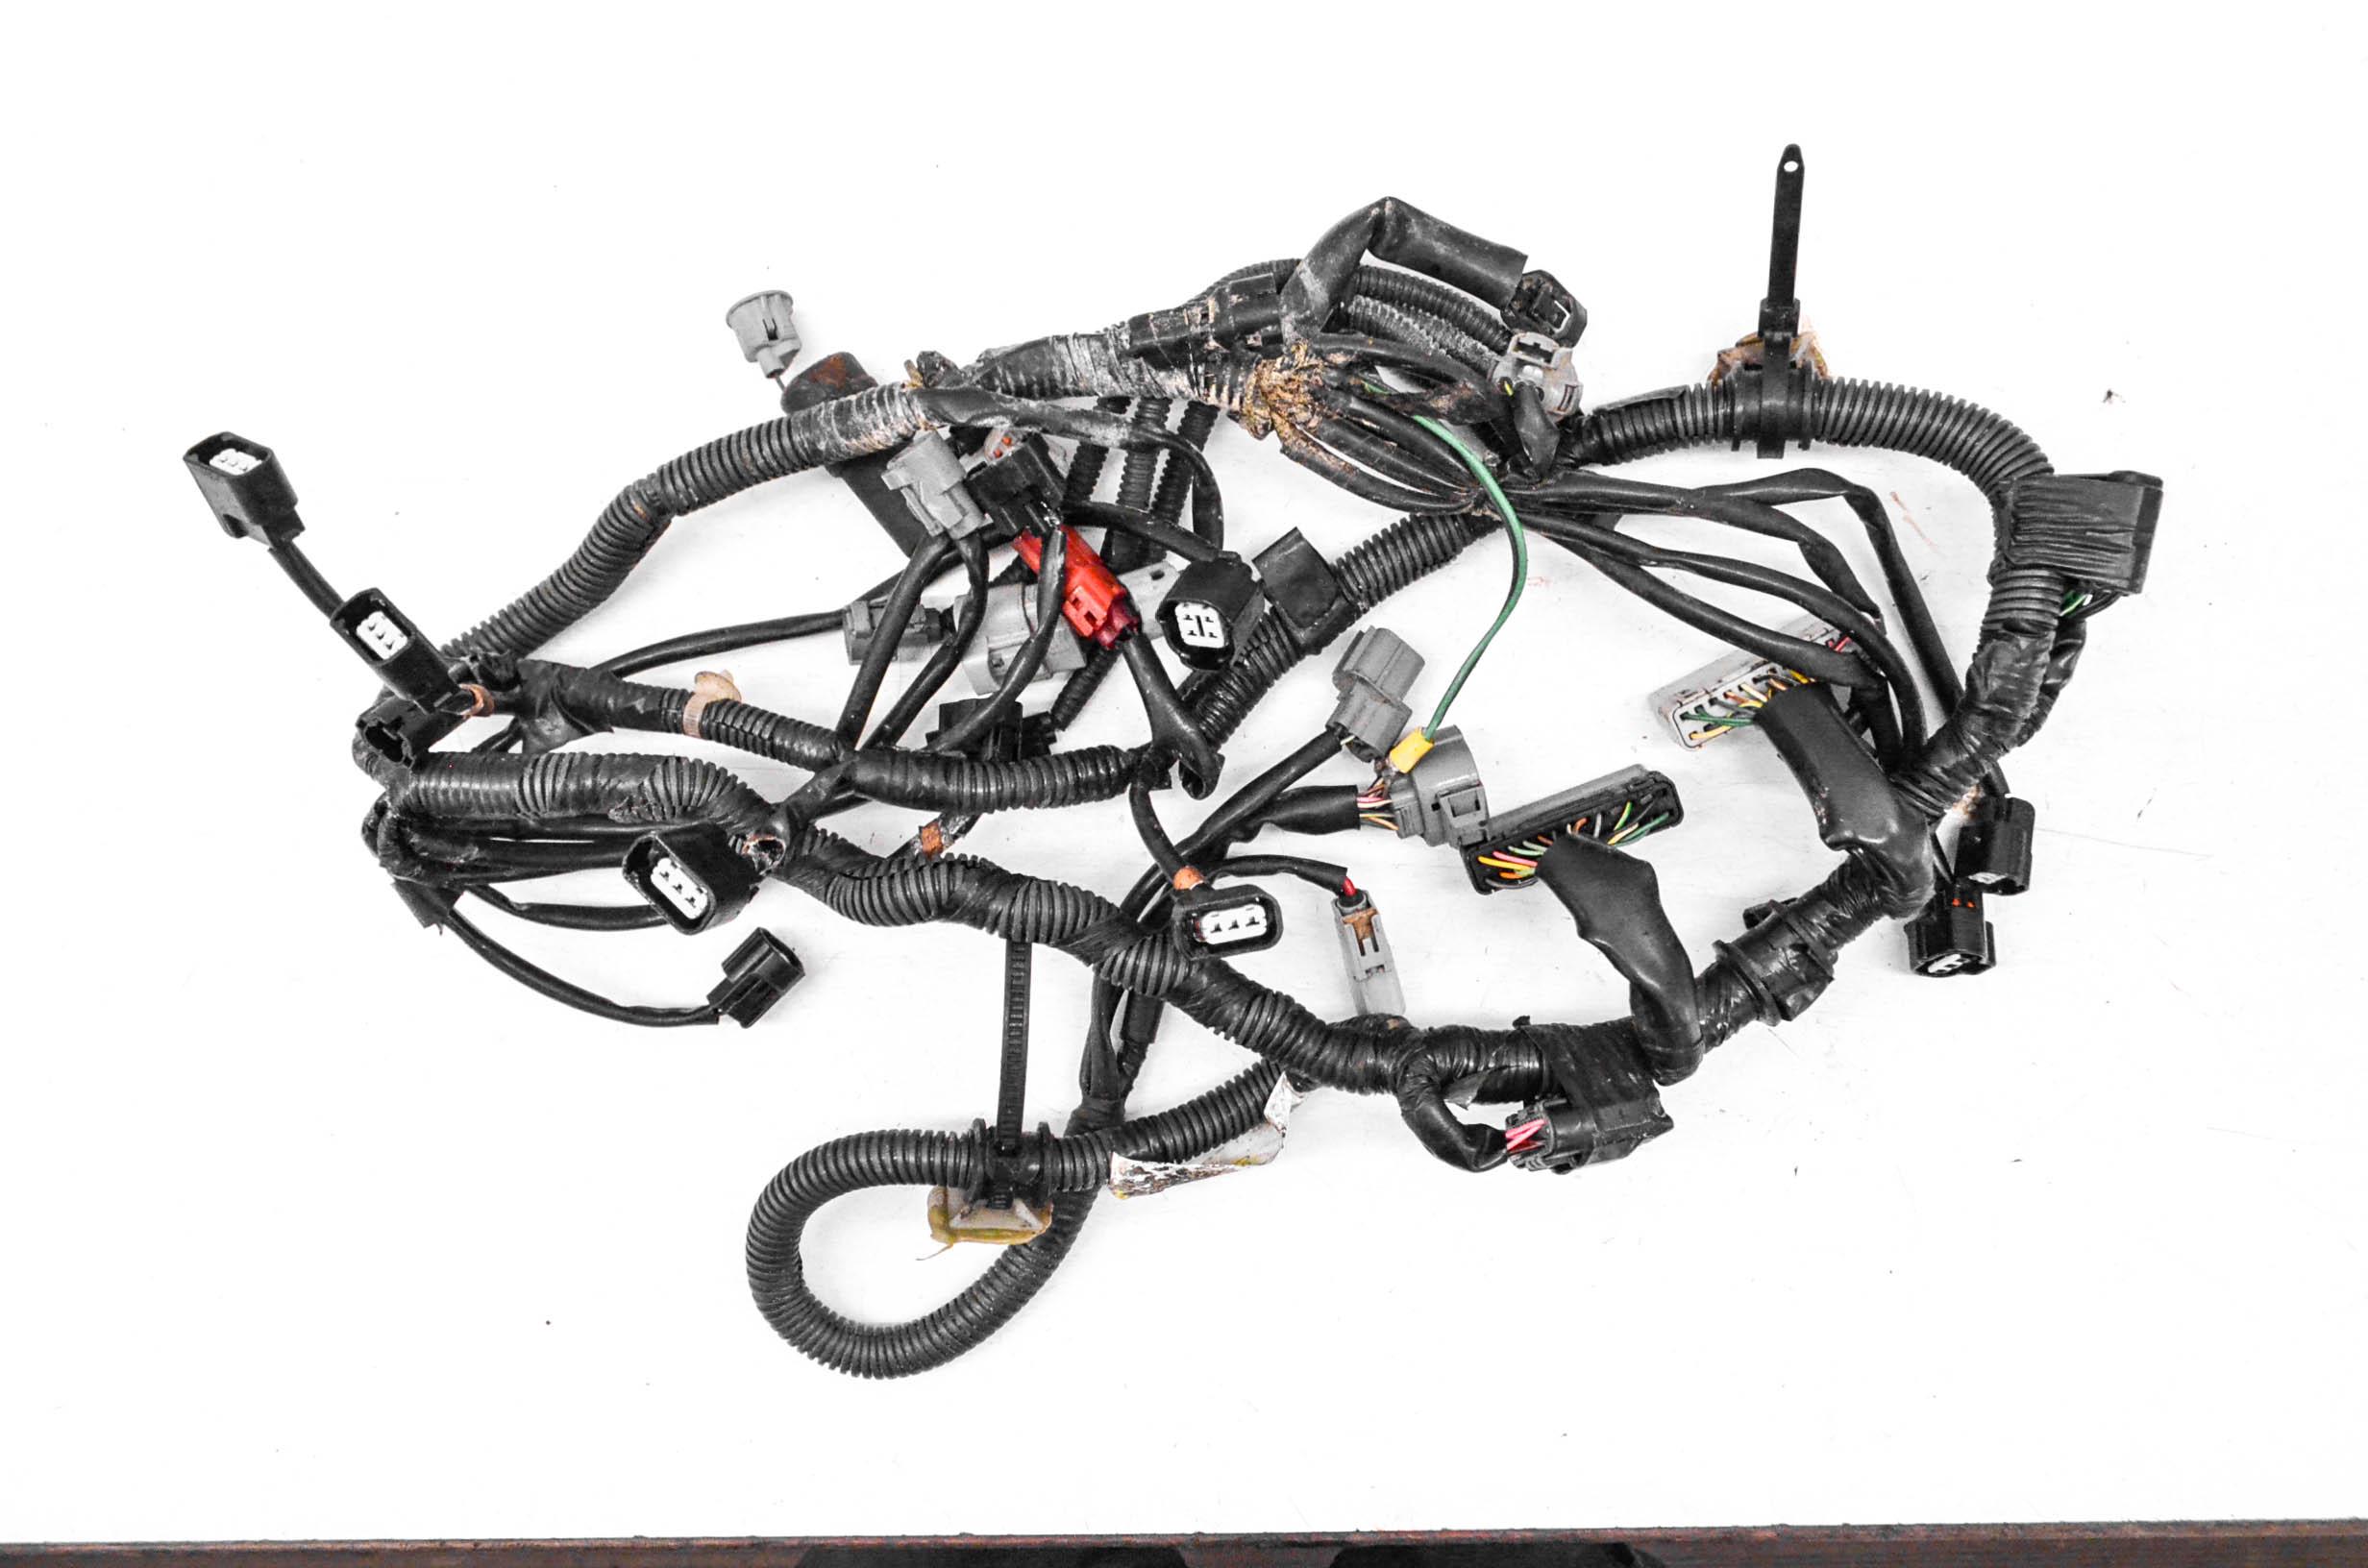 04 Honda Aquatrax F 12x Engine Wire Harness Electrical